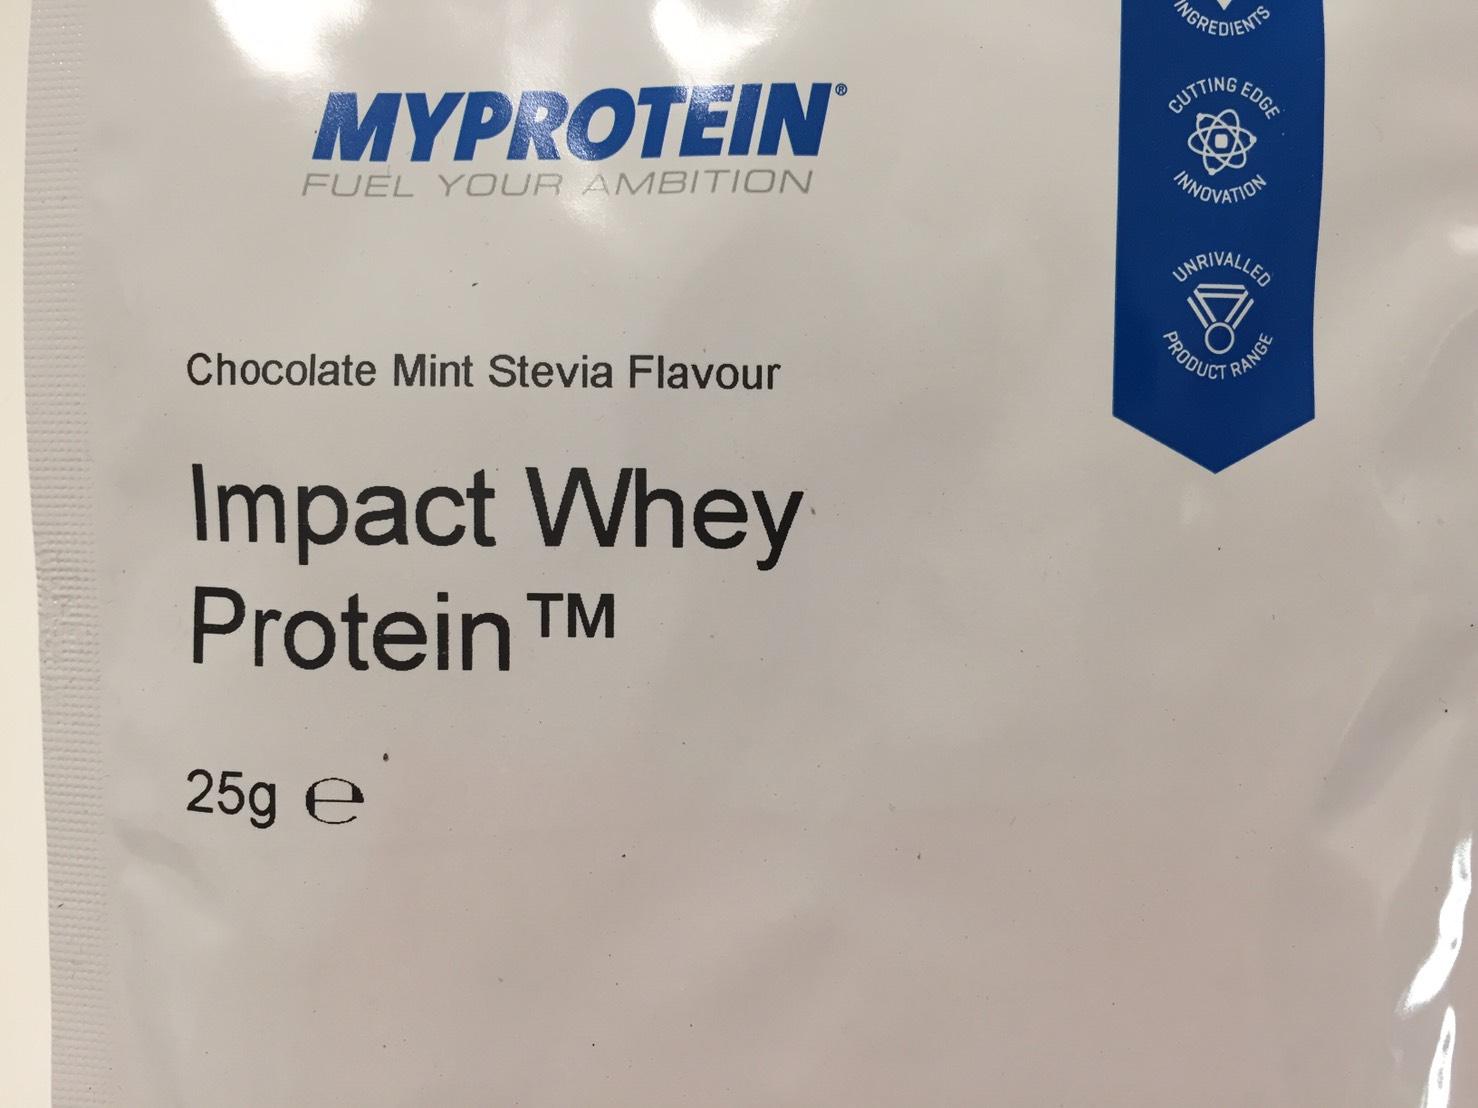 Chocolate Mint Stevia Flavour(チョコレートミントステビア味)